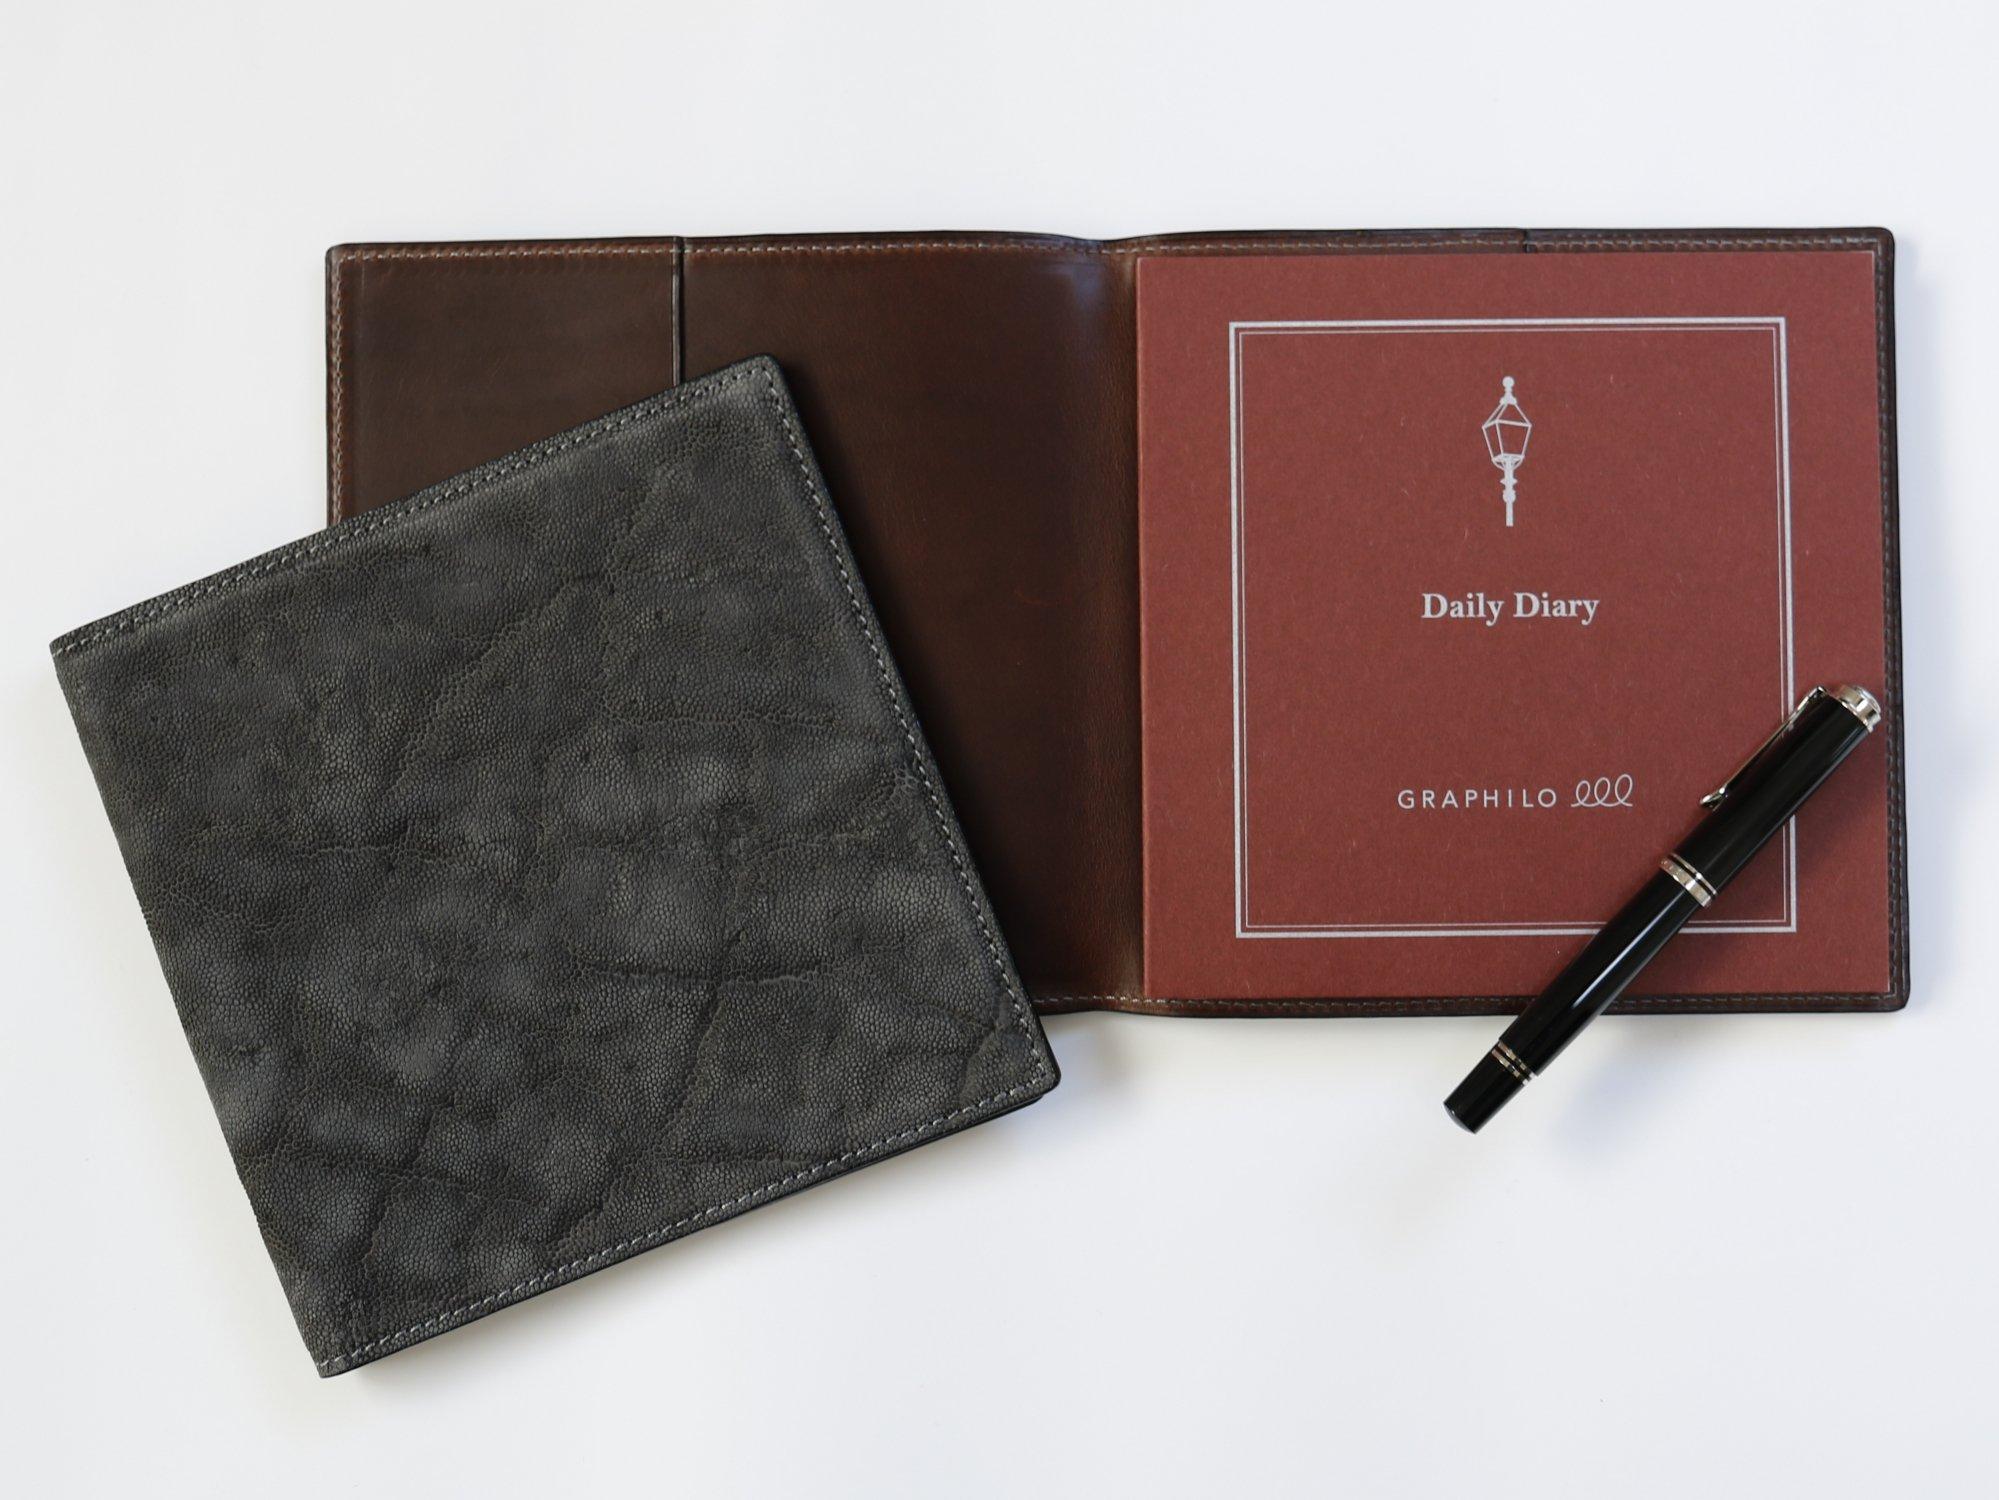 OUDE 正方形革カバー|シングルタイプ|エレファント・グレー(内革ダークブラウン)